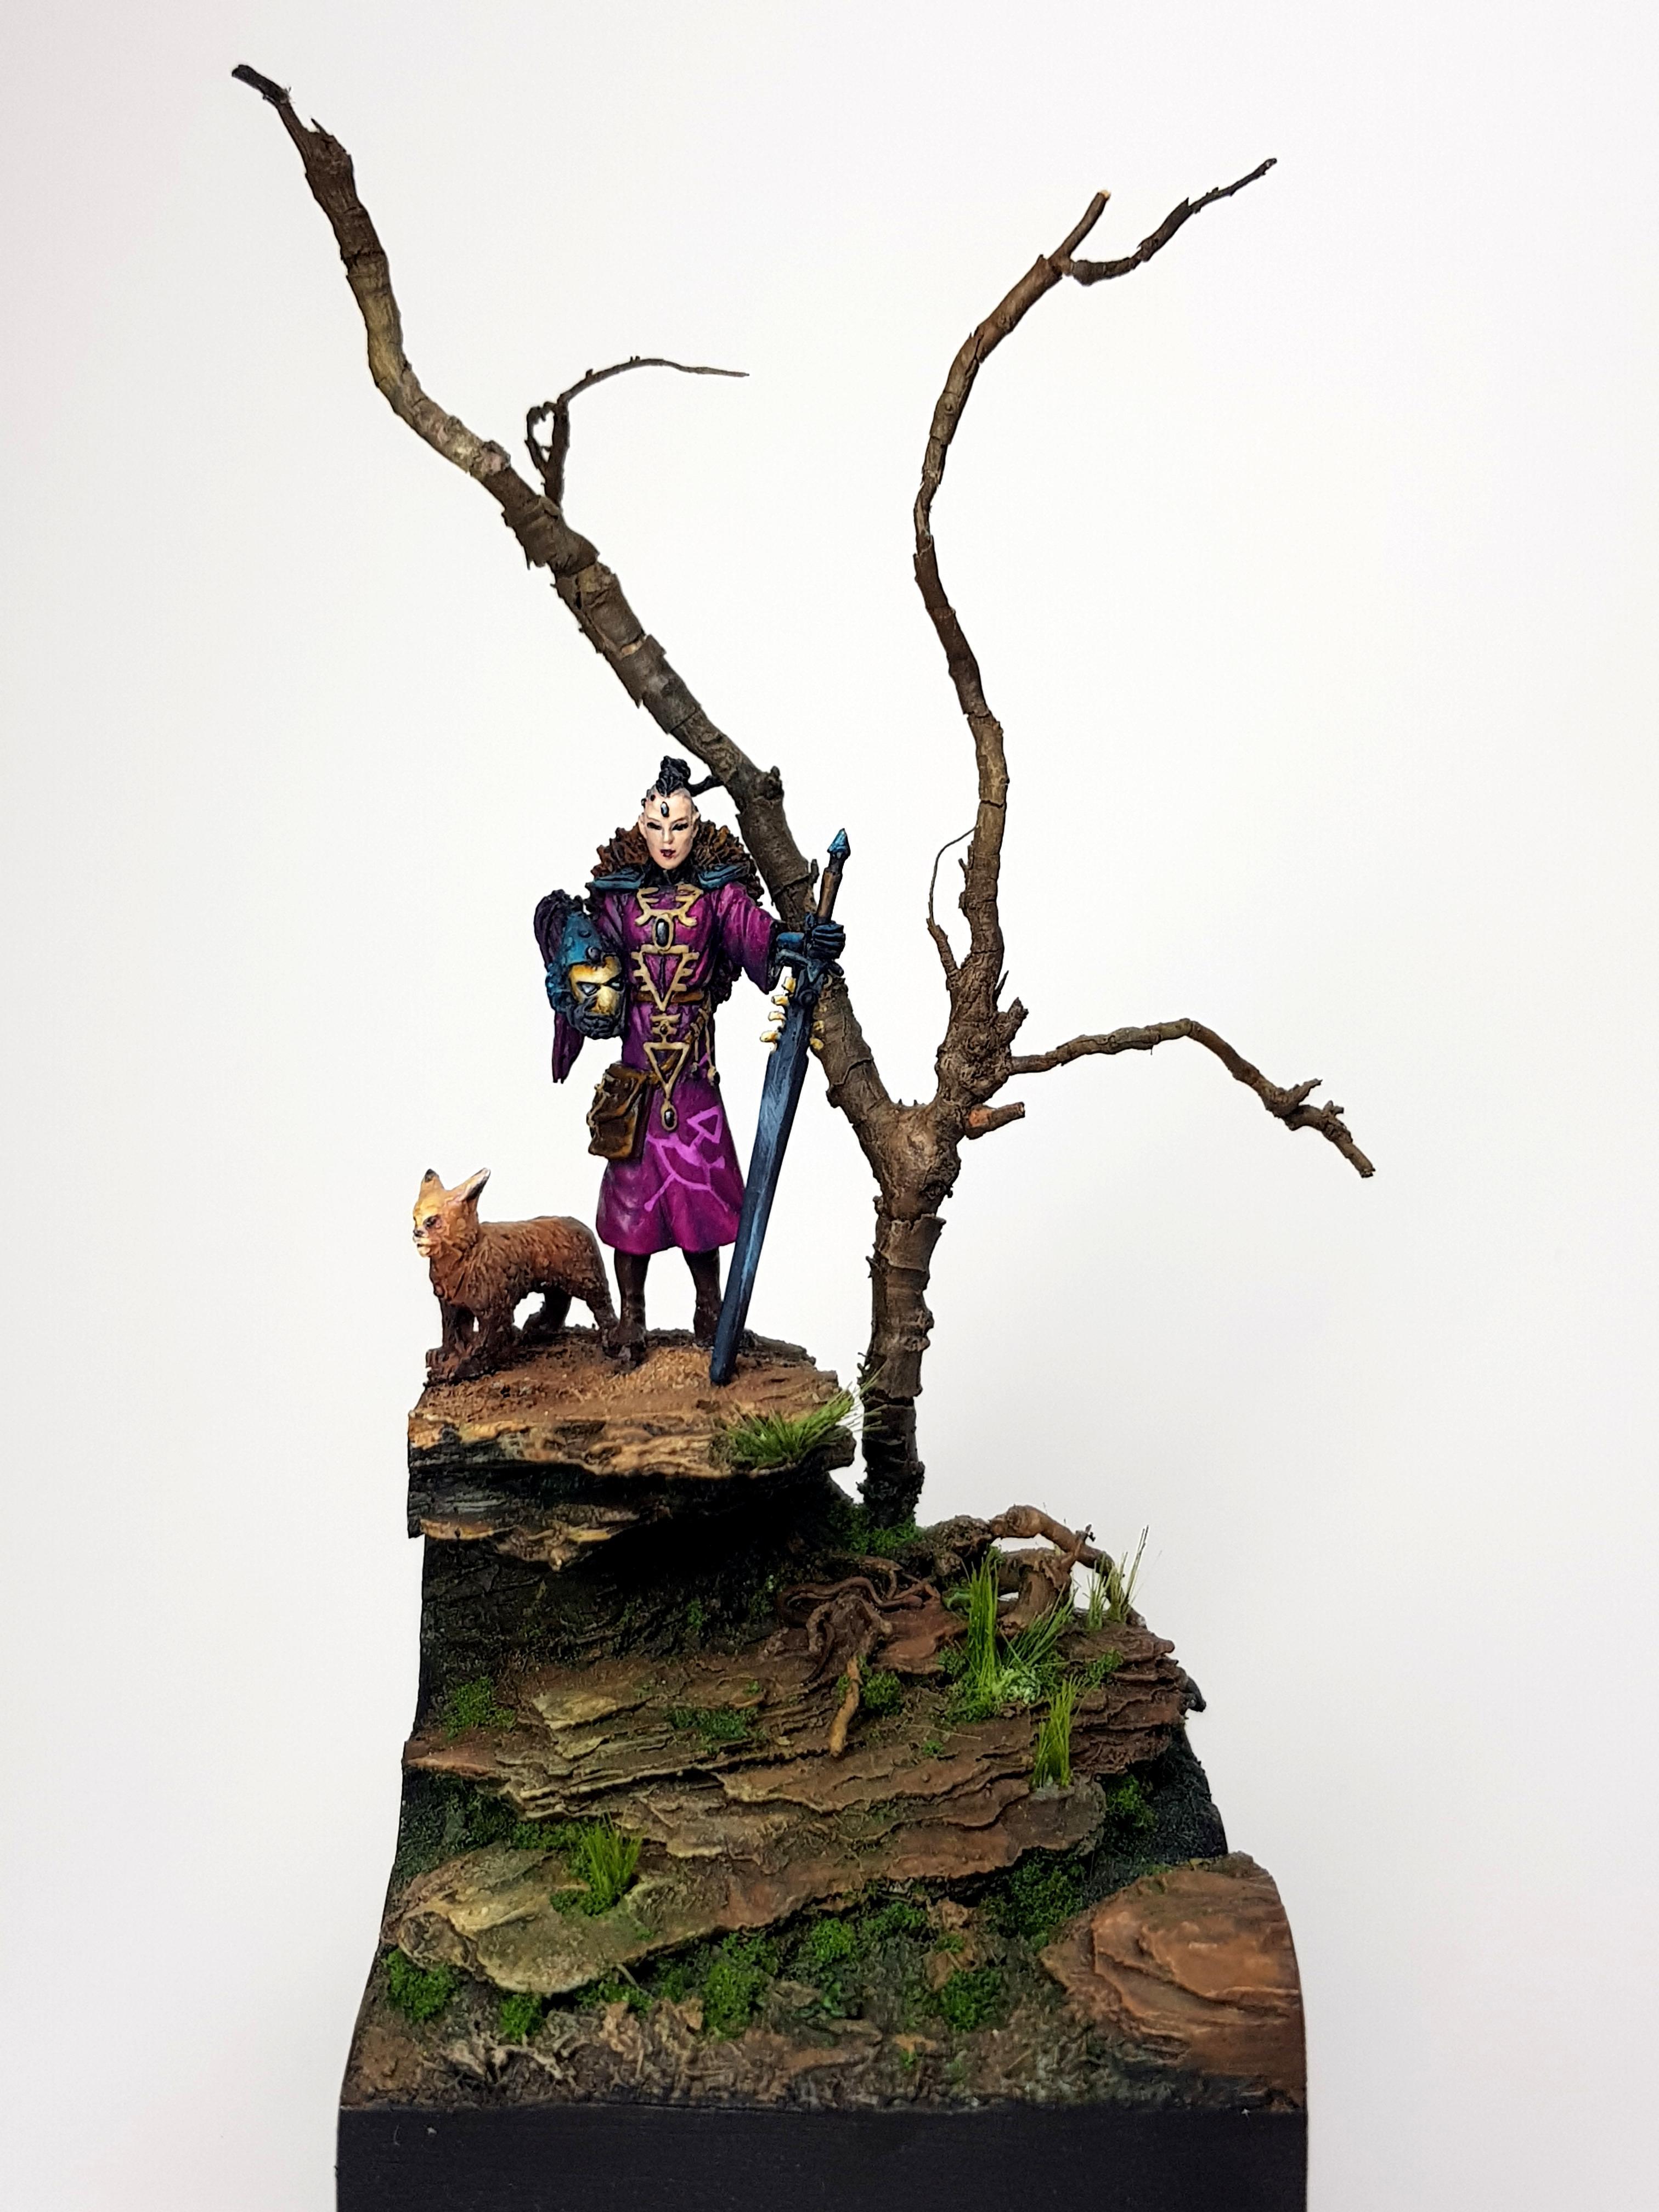 Eldar, Eldar Warlock, Gyrinx, Warhammer 40,000, Warlock